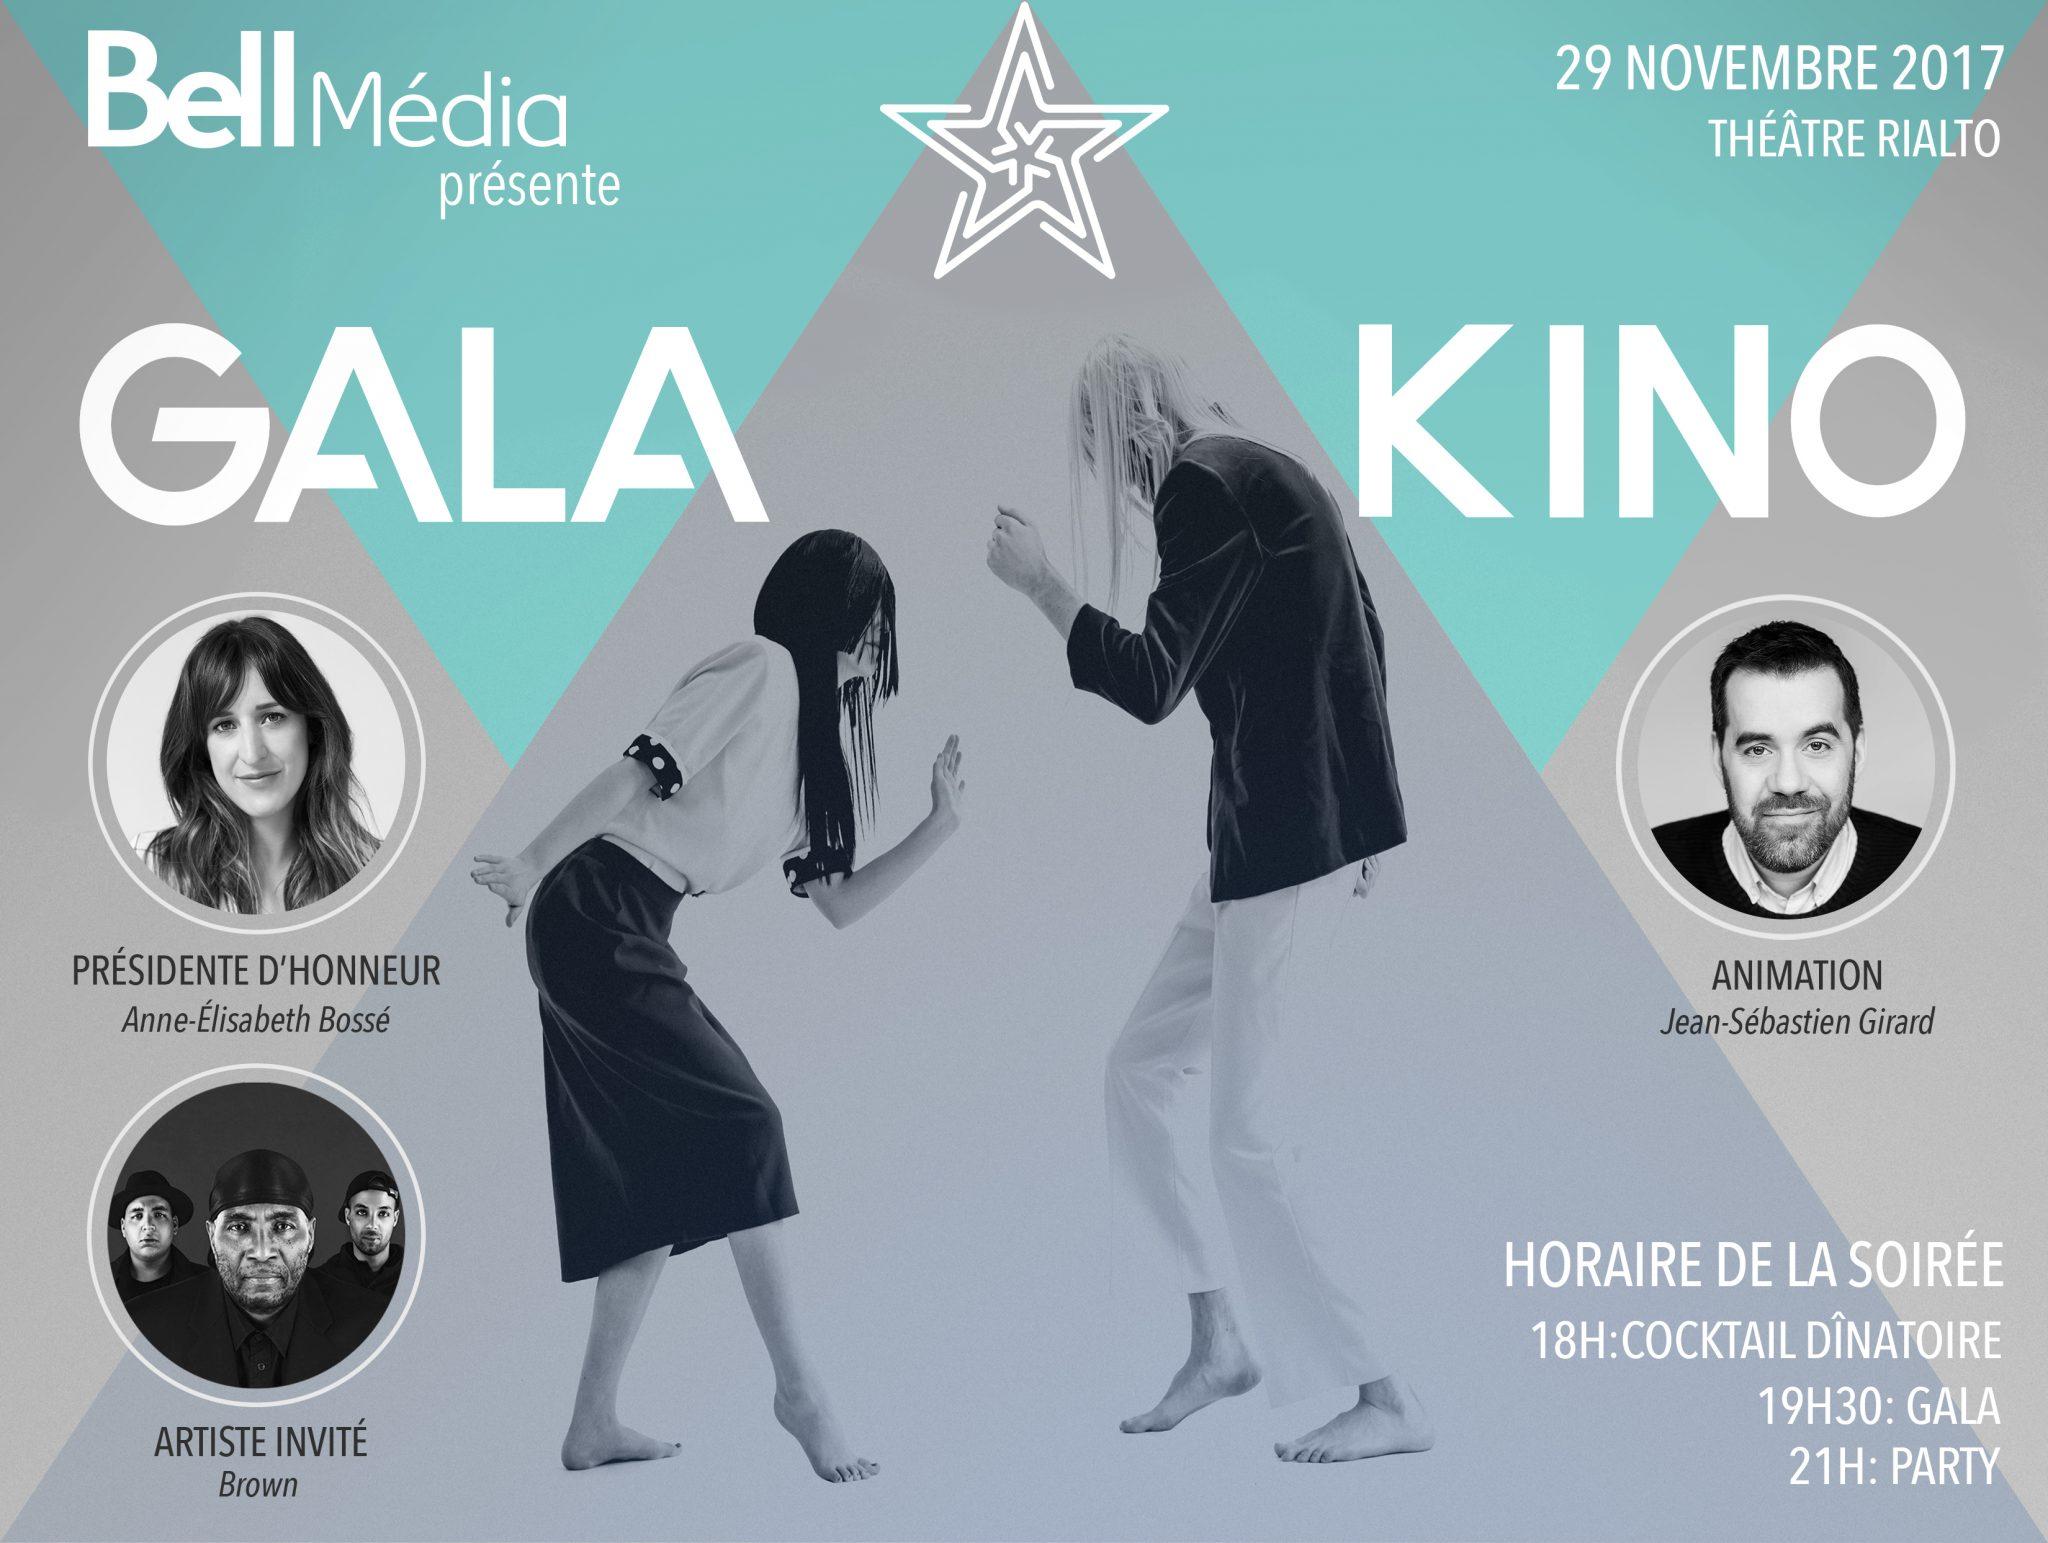 Bell Média et Kino'00 vous invitent au Gala Kino 2017